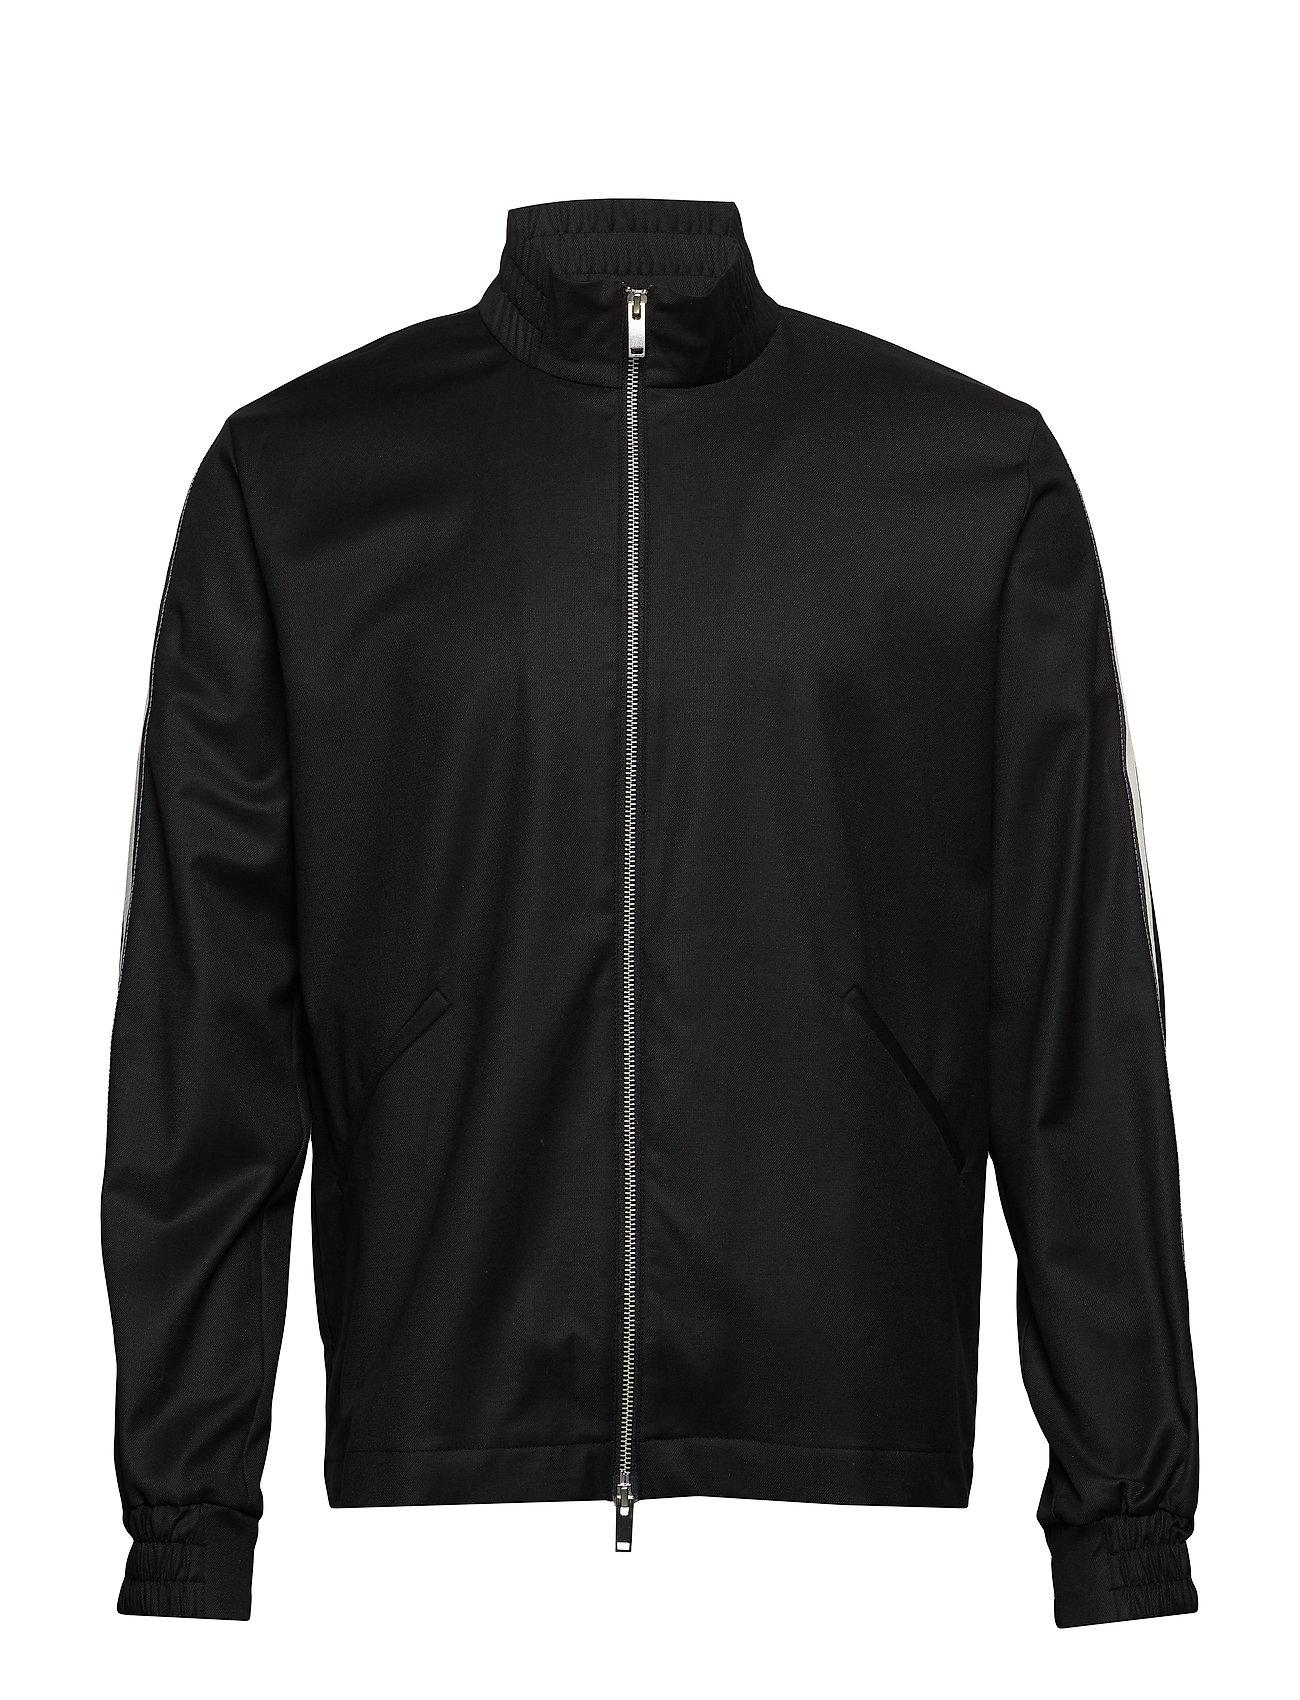 HOLZWEILER RASMUS Jacket-Black - BLACK